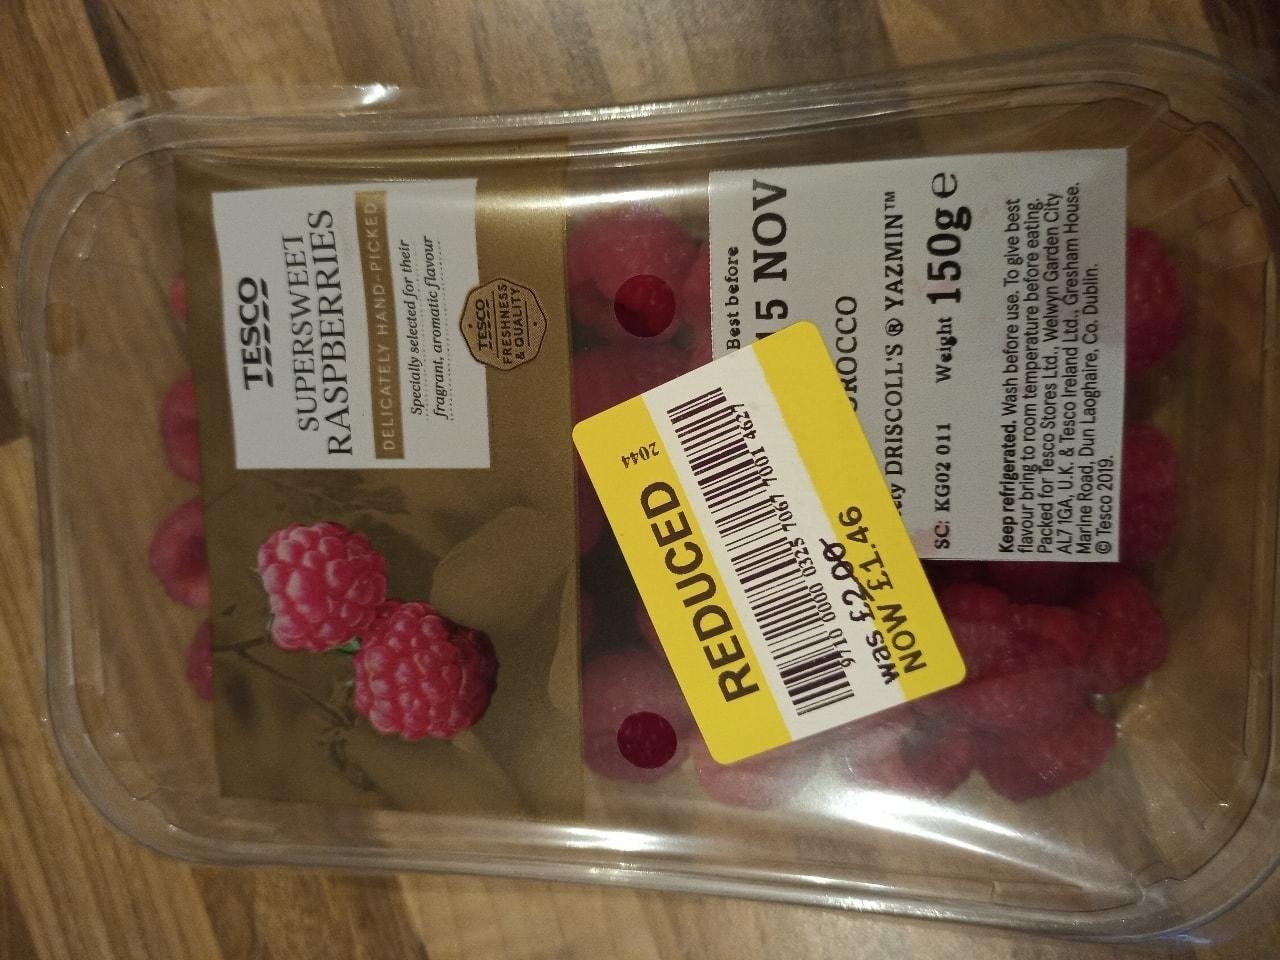 Super sweet raspberries